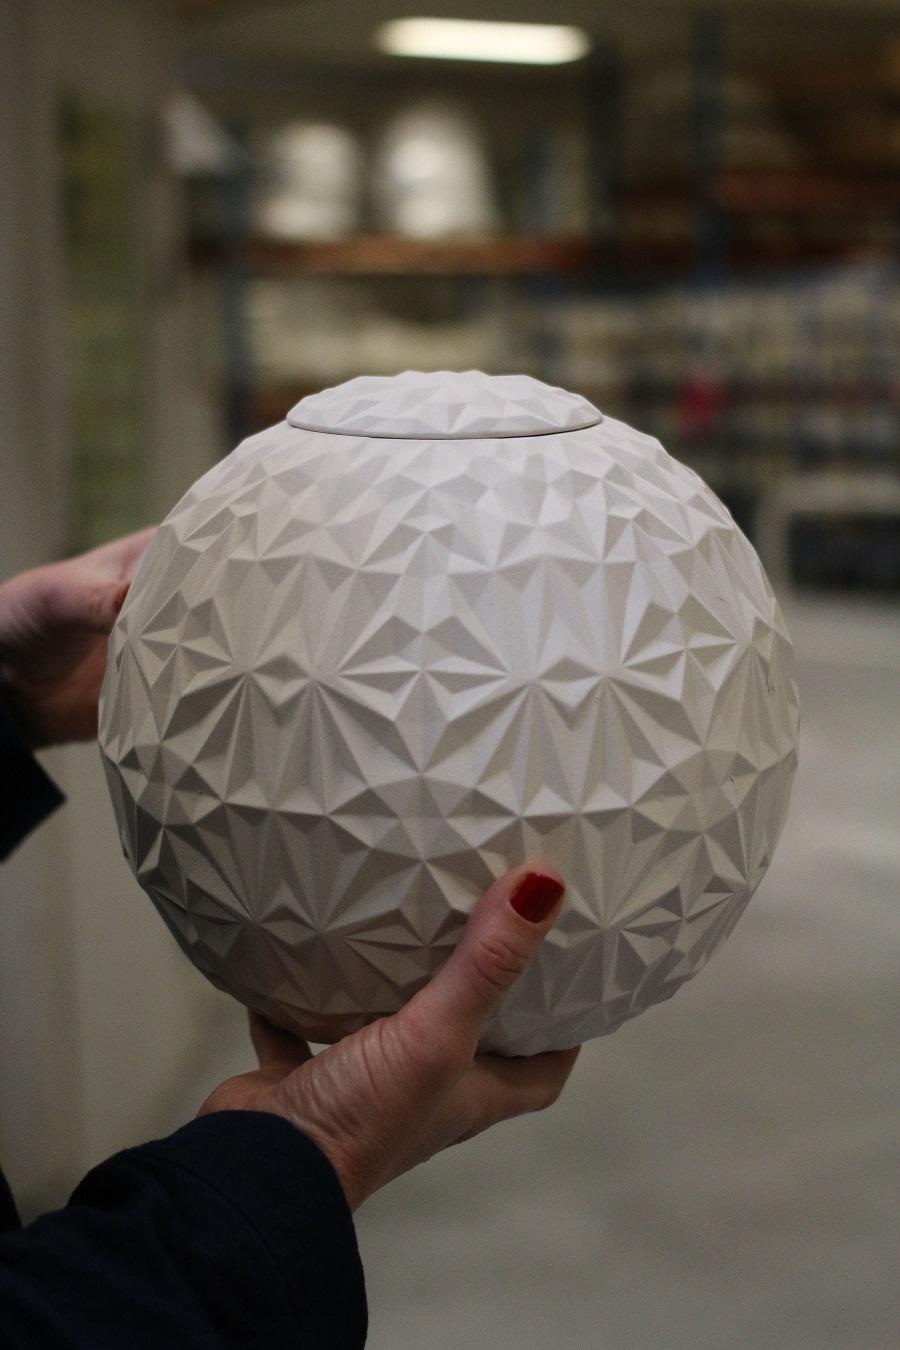 Anna Elzer Oscarsson - Dusty Diamonds - Unglazed - West Sweden Design